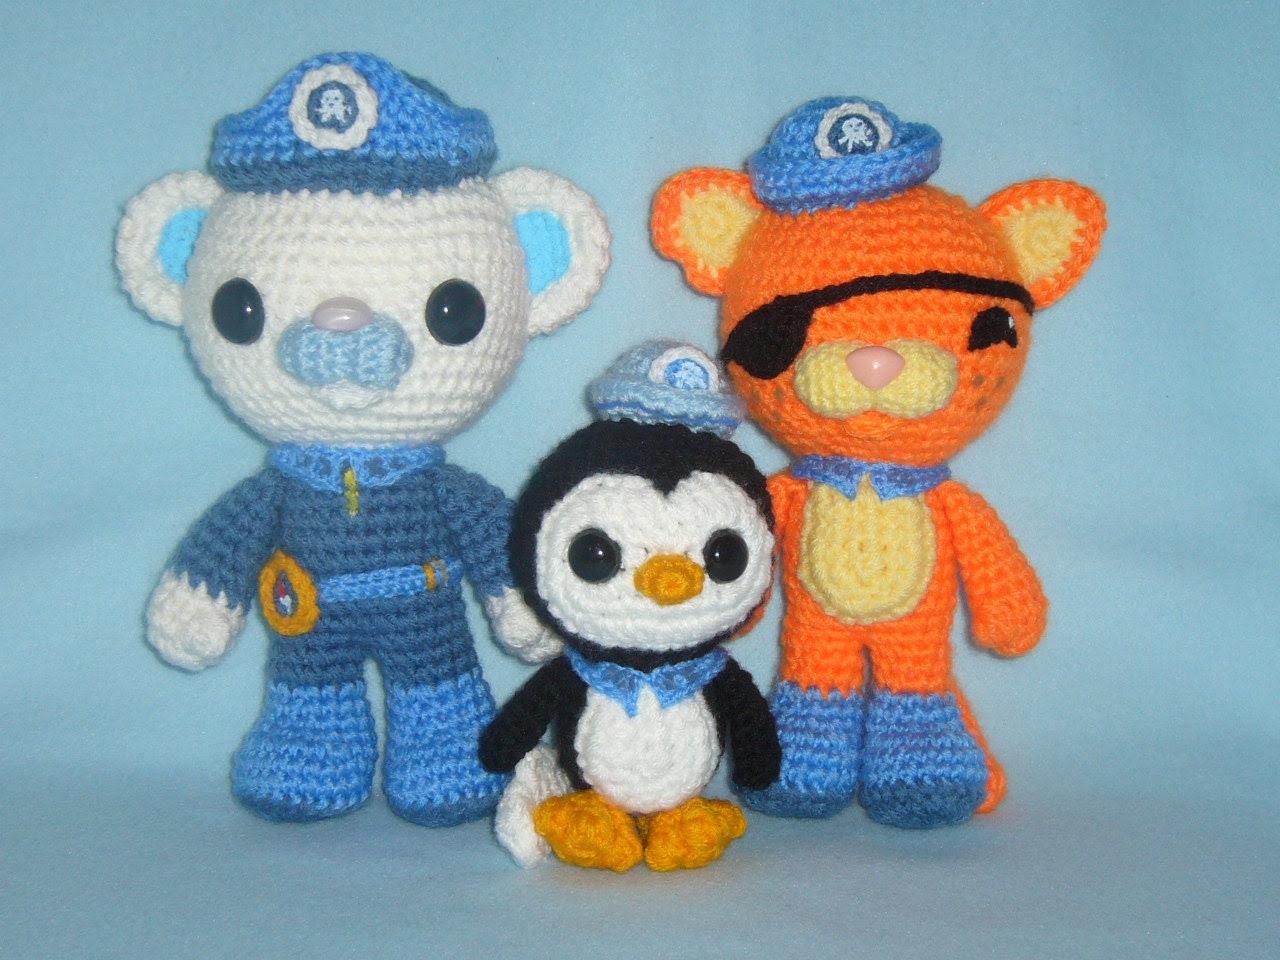 Octonauts team toys crochet PATTERNS PDF